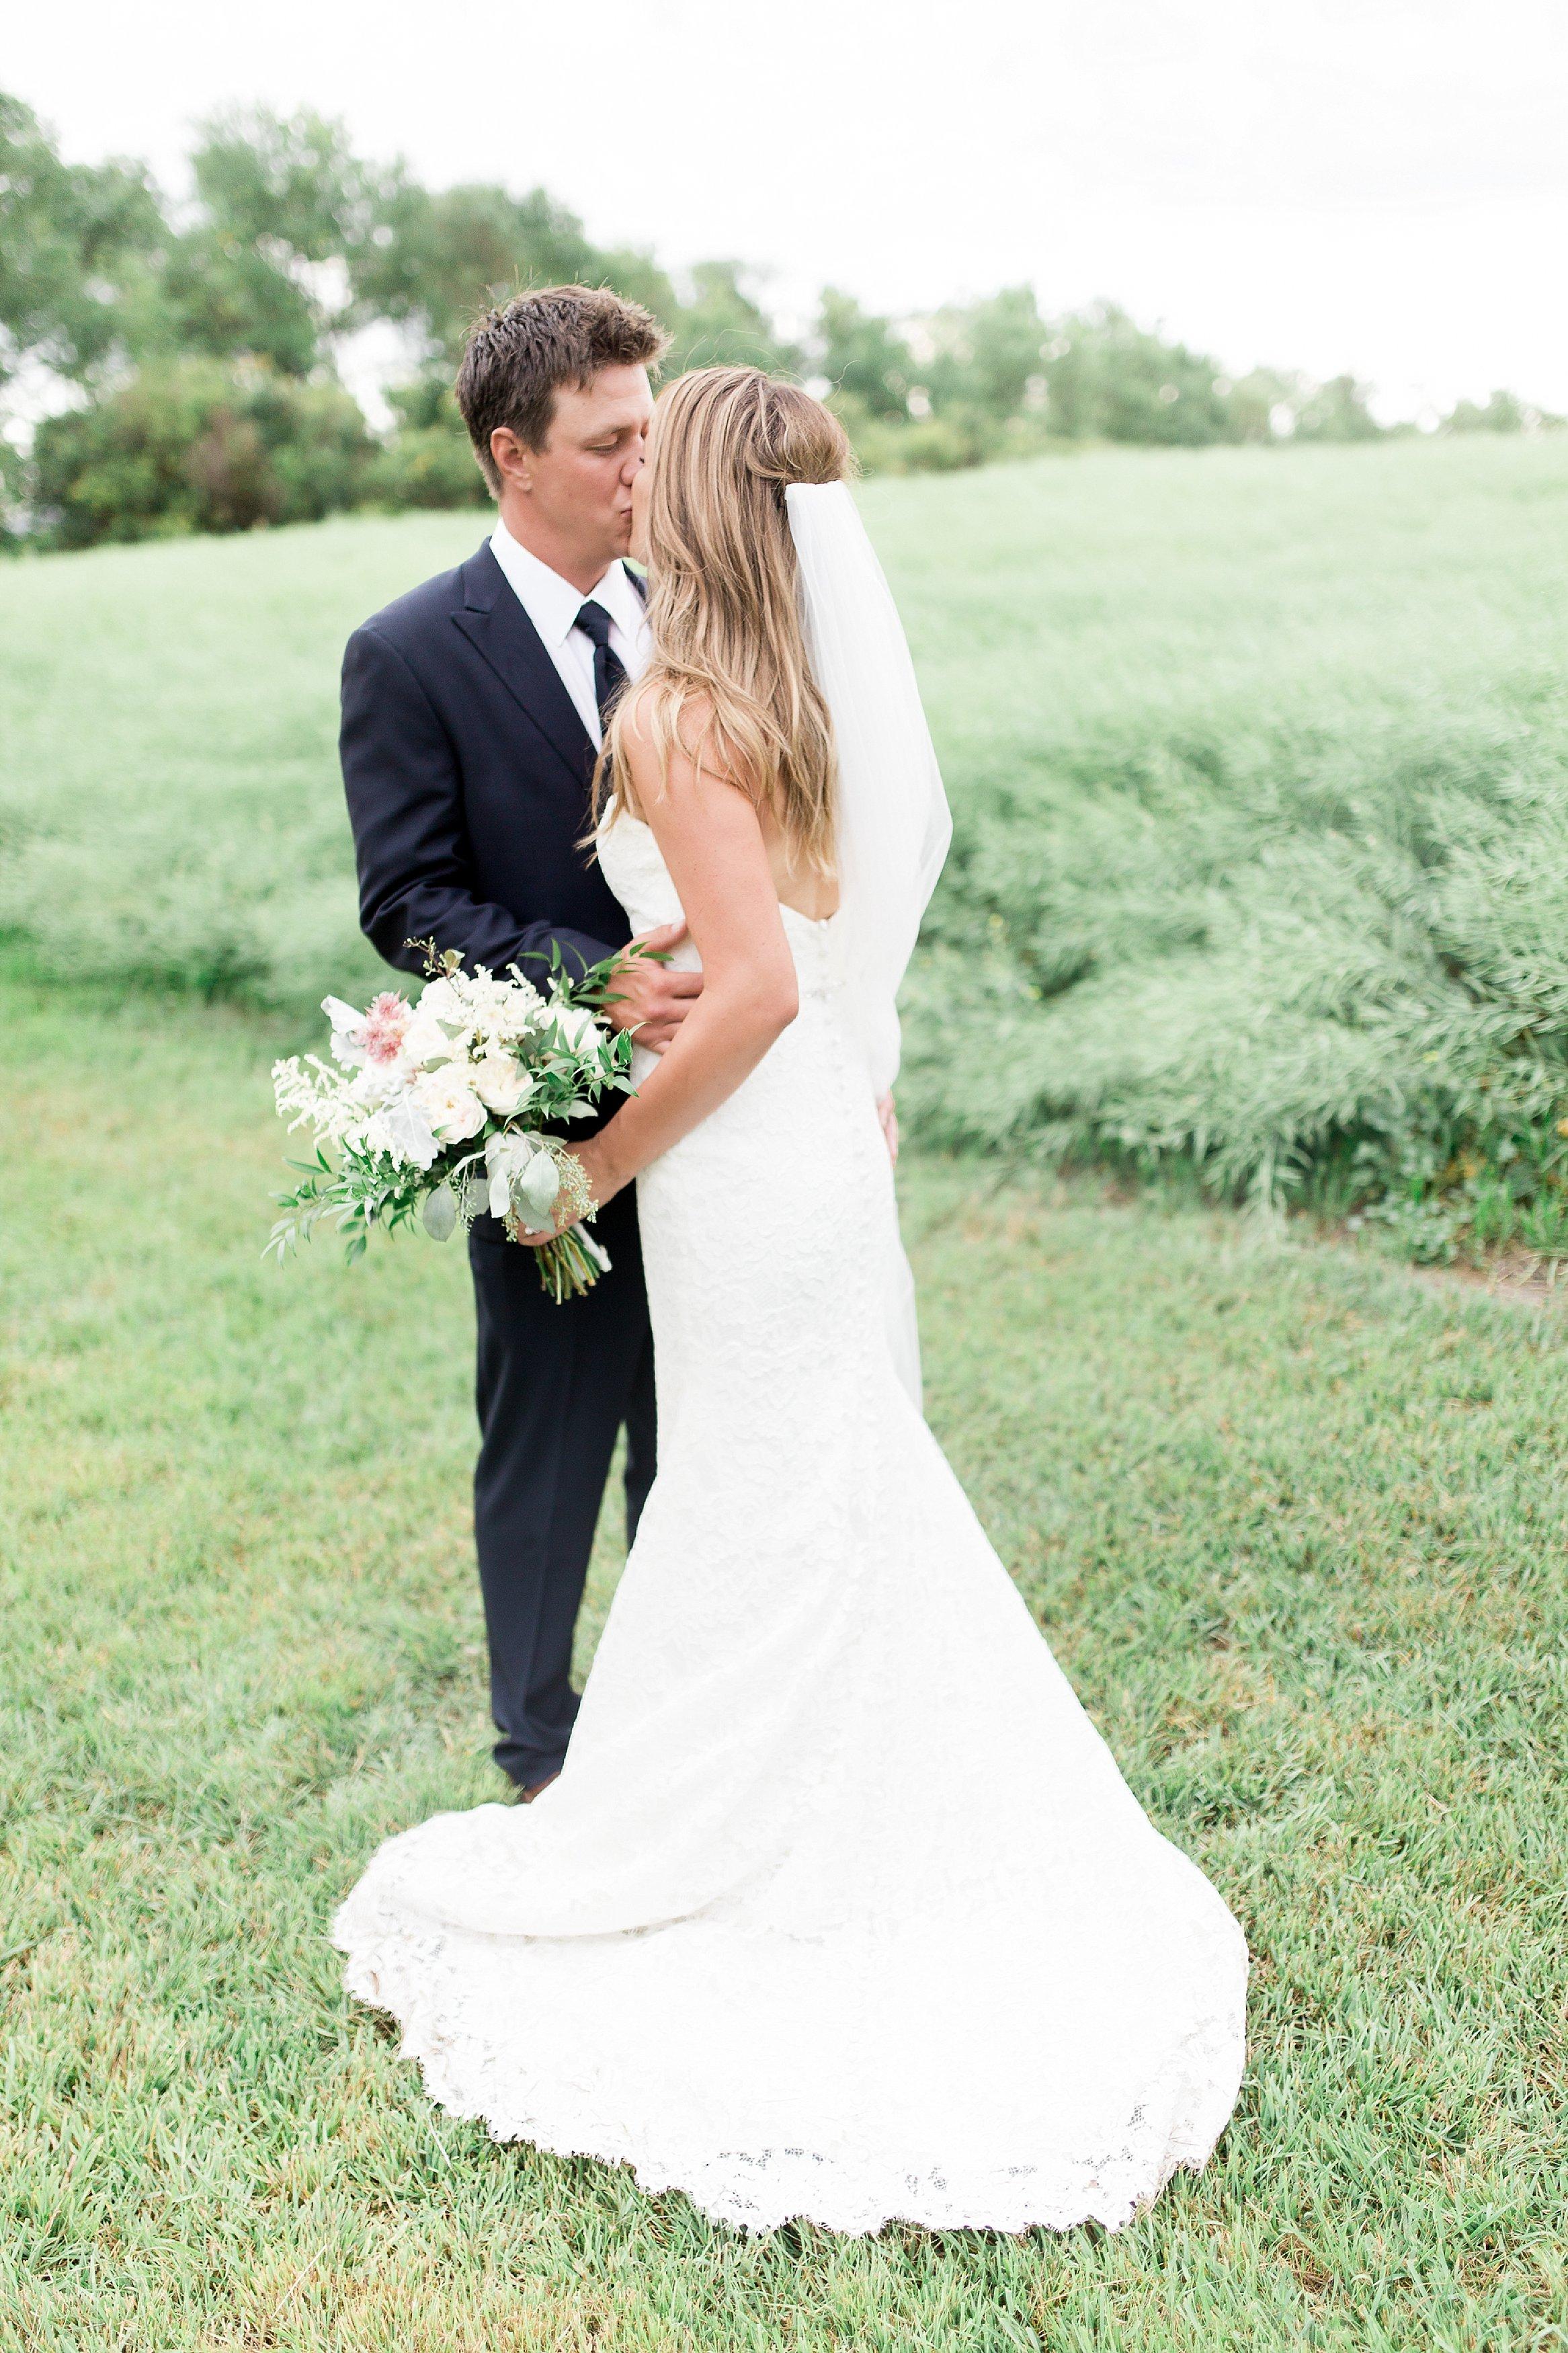 Toronto wedding photographer   Keila Marie Photography   romantic Bride and groom portraits  Garden inspired wedding